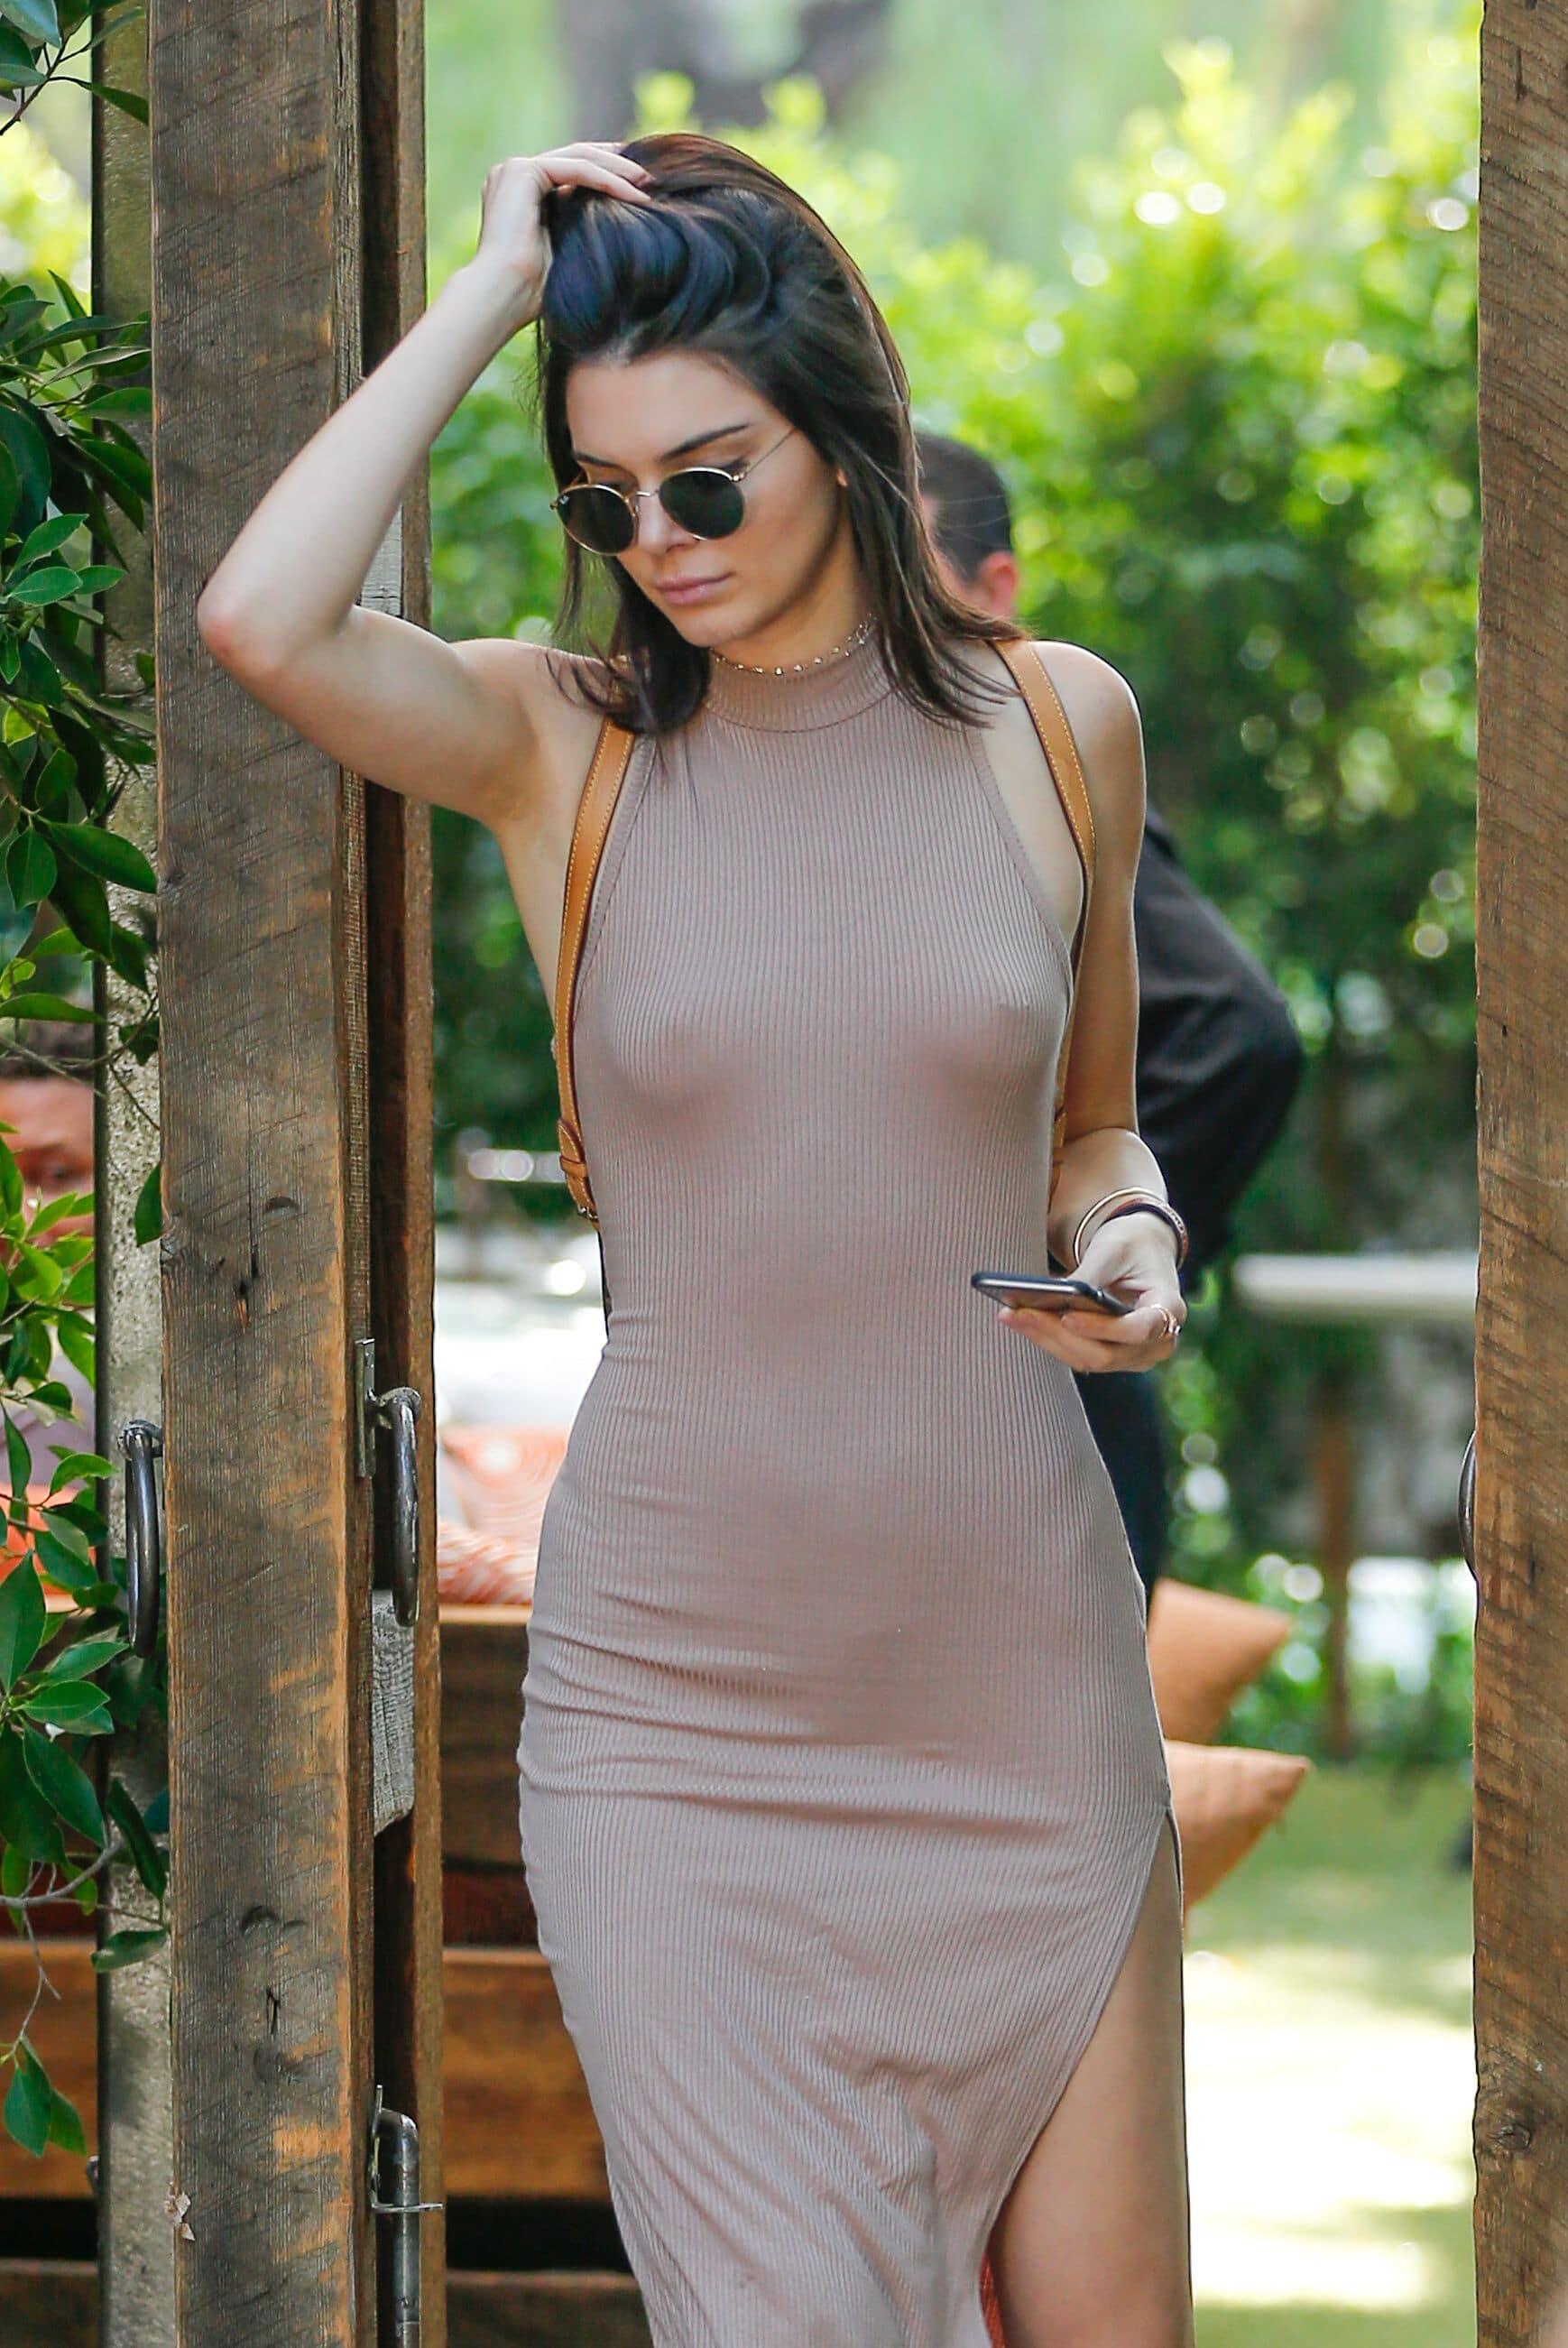 Kendall Jenner natural tits